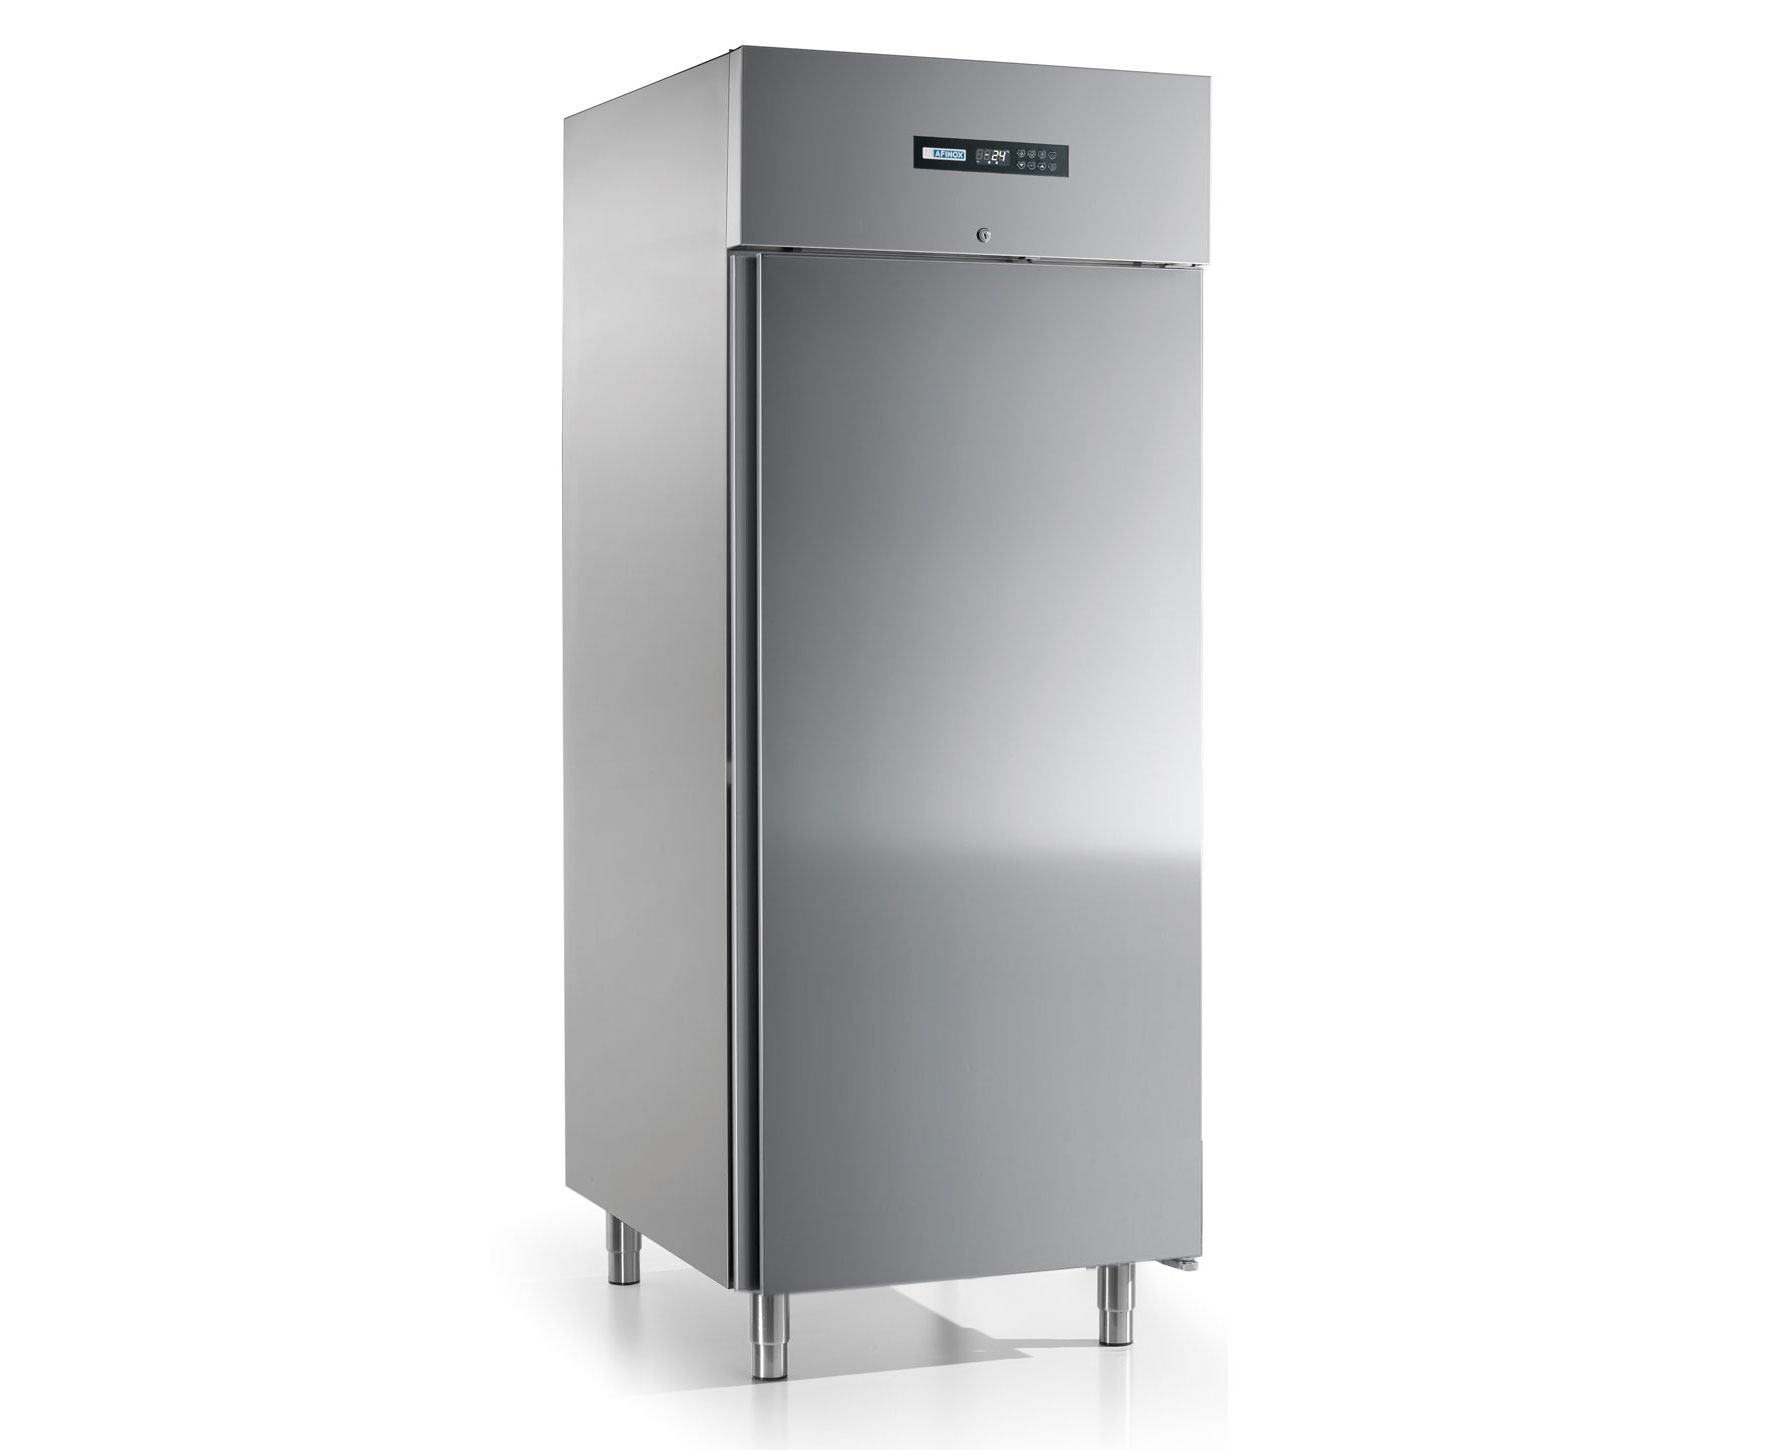 energy gelateria 700-900, energy pasticceria